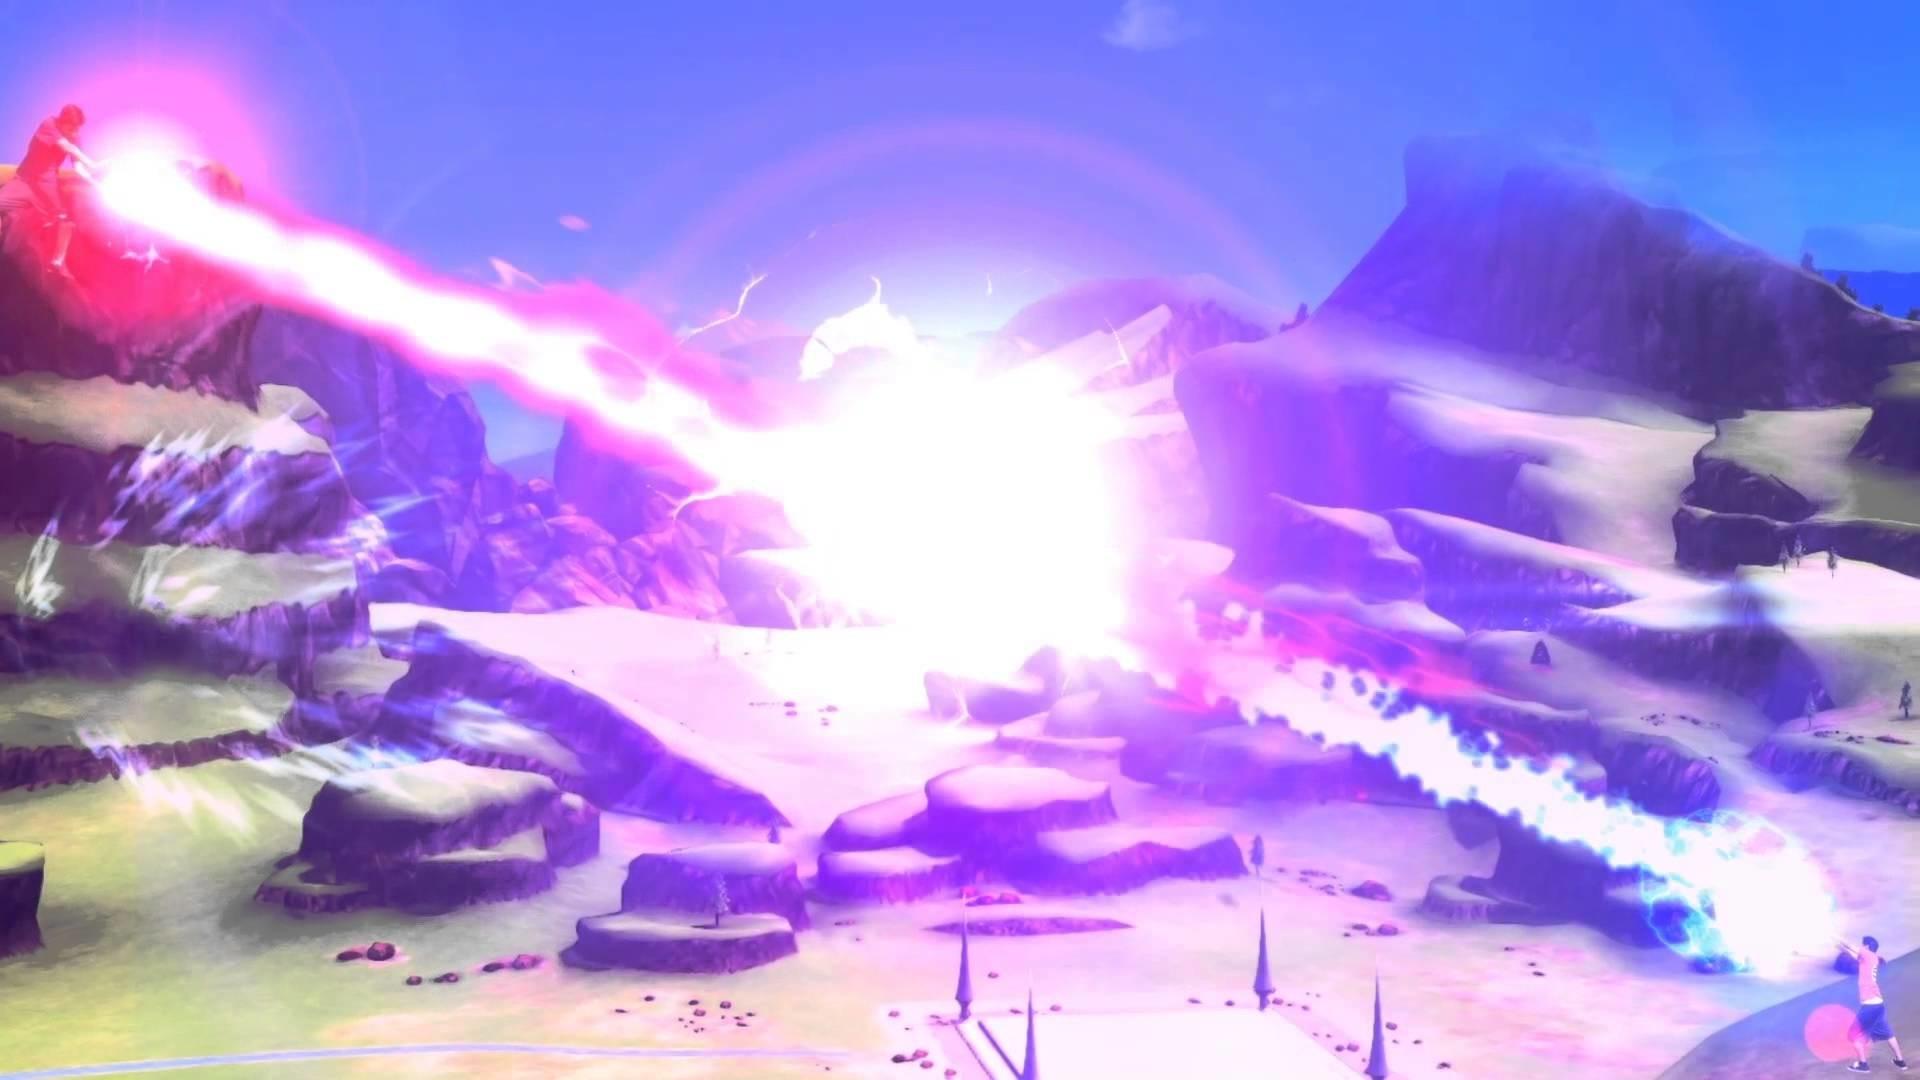 Live Wallpaper Dragon Ball Iphone X Goku Kamehameha Wallpaper 69 Images